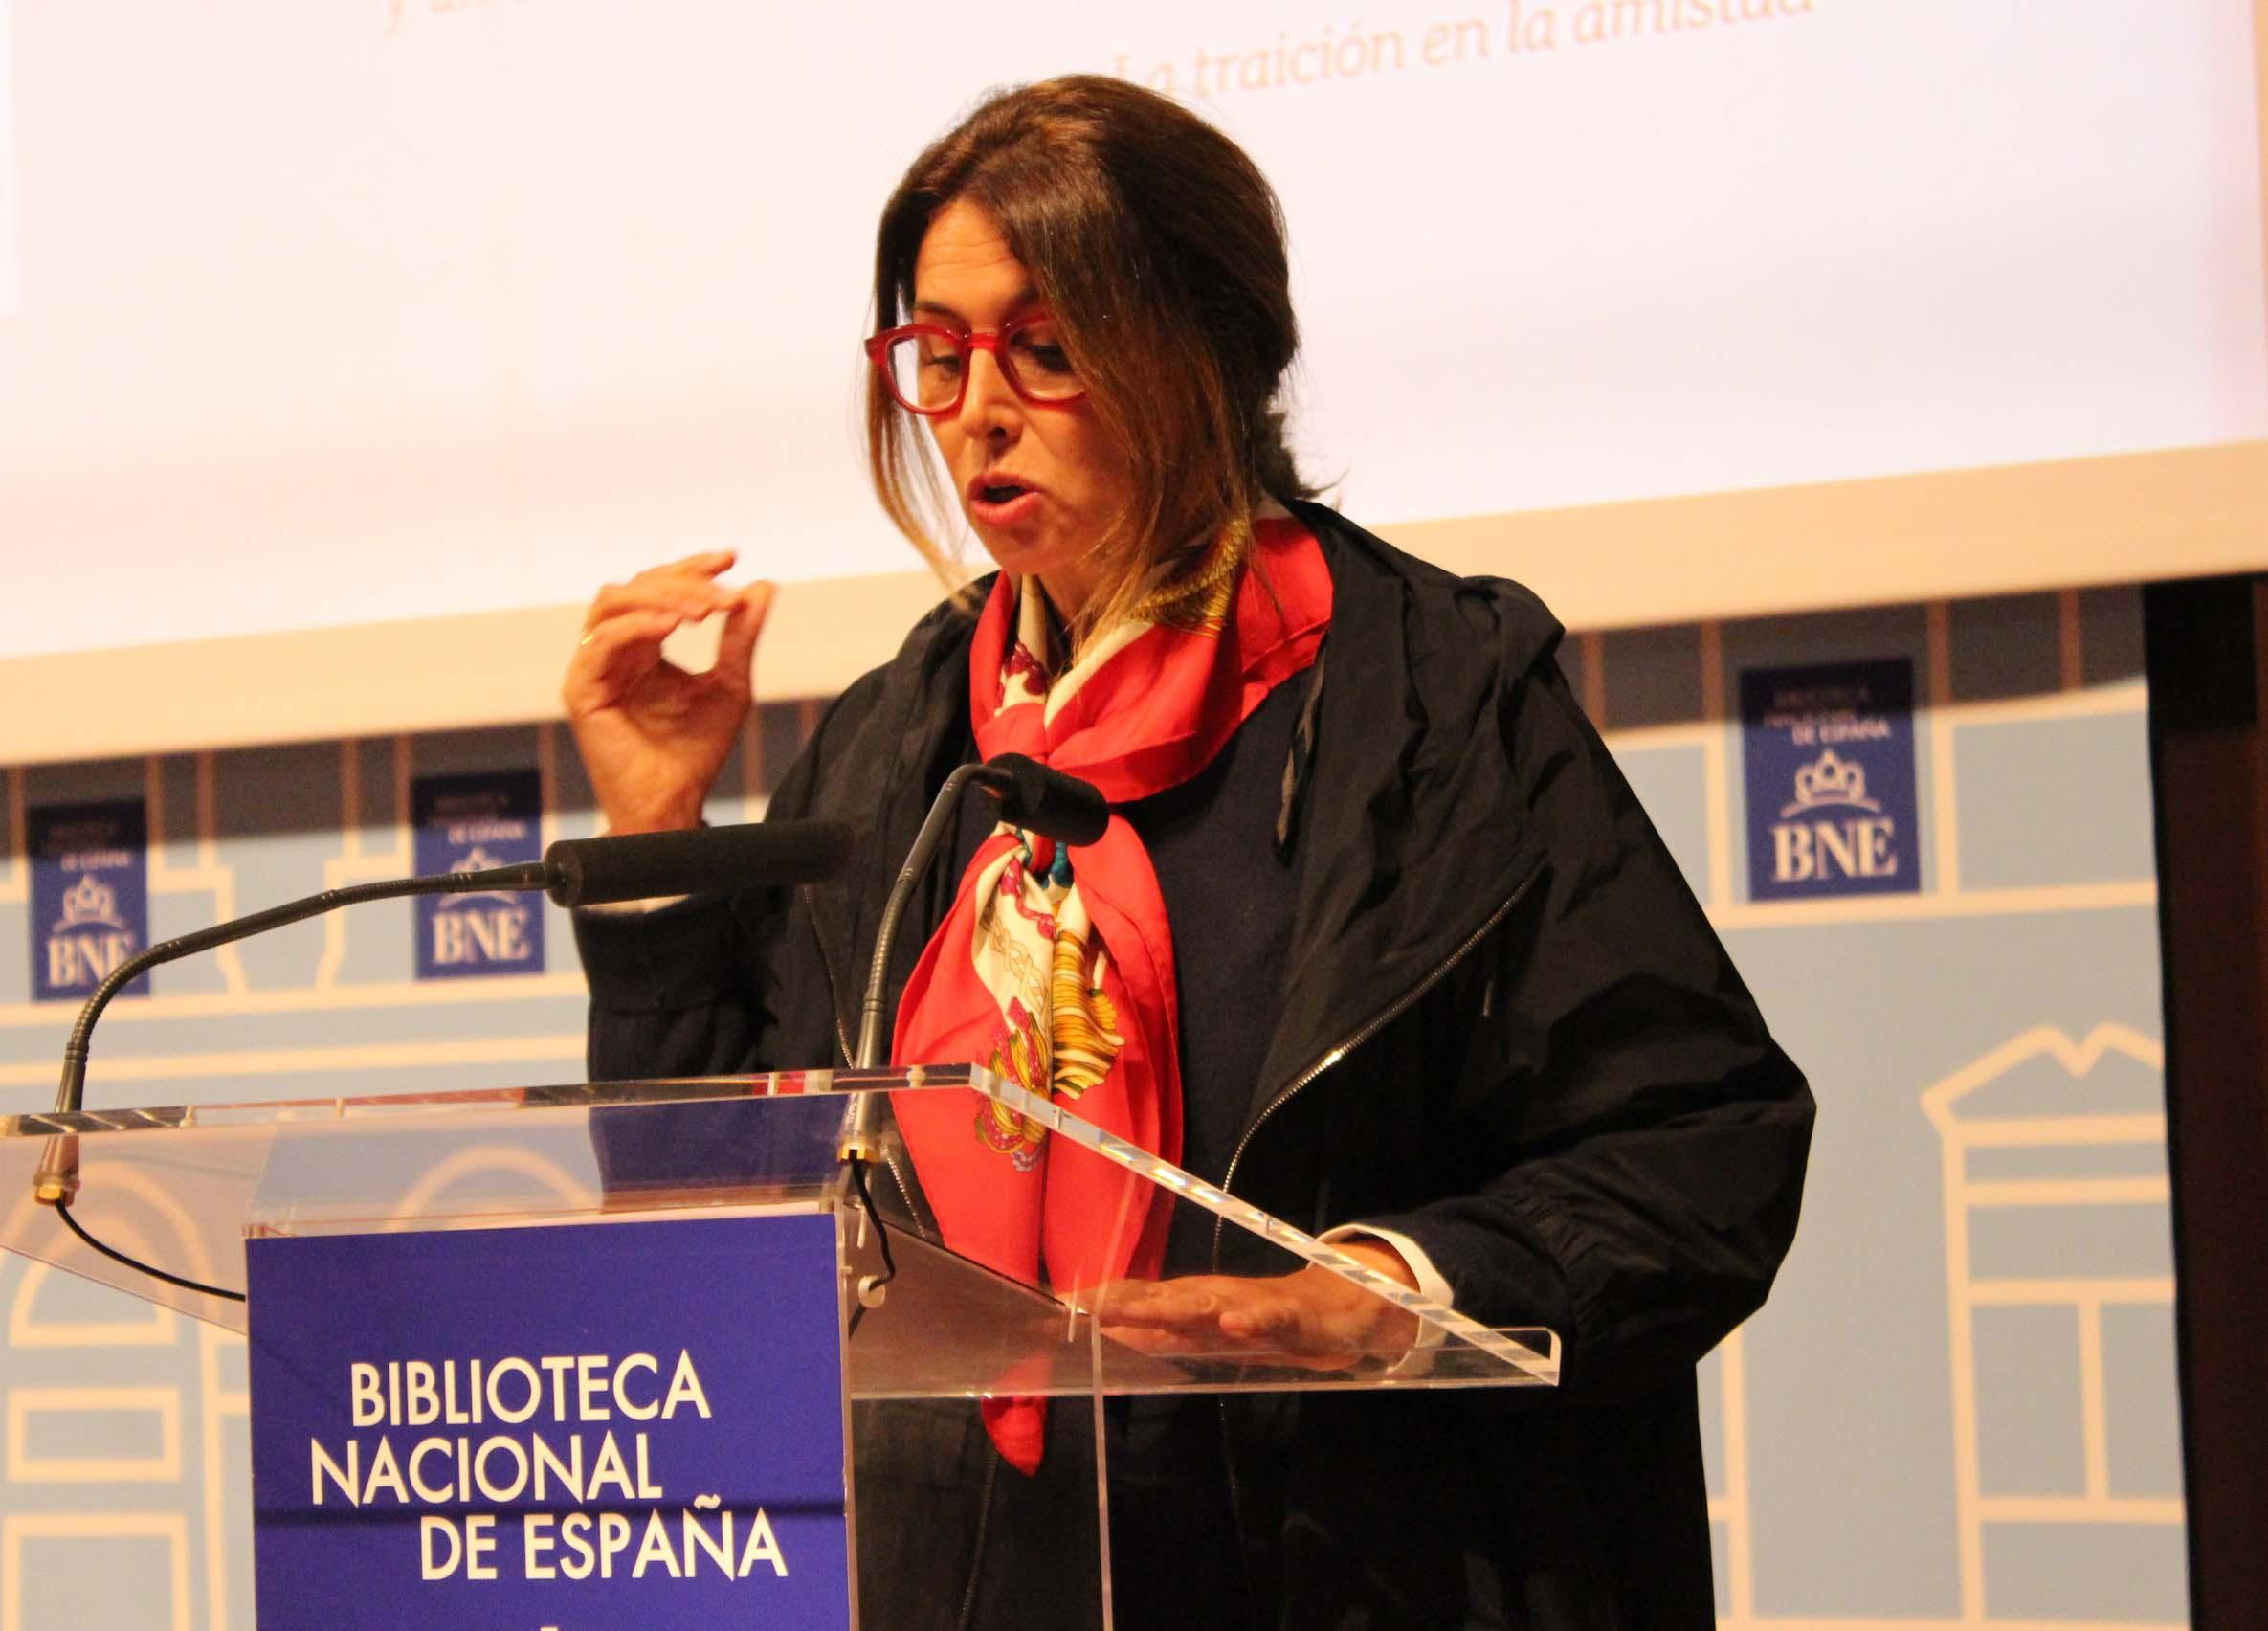 2018 Ana García Siñeriz